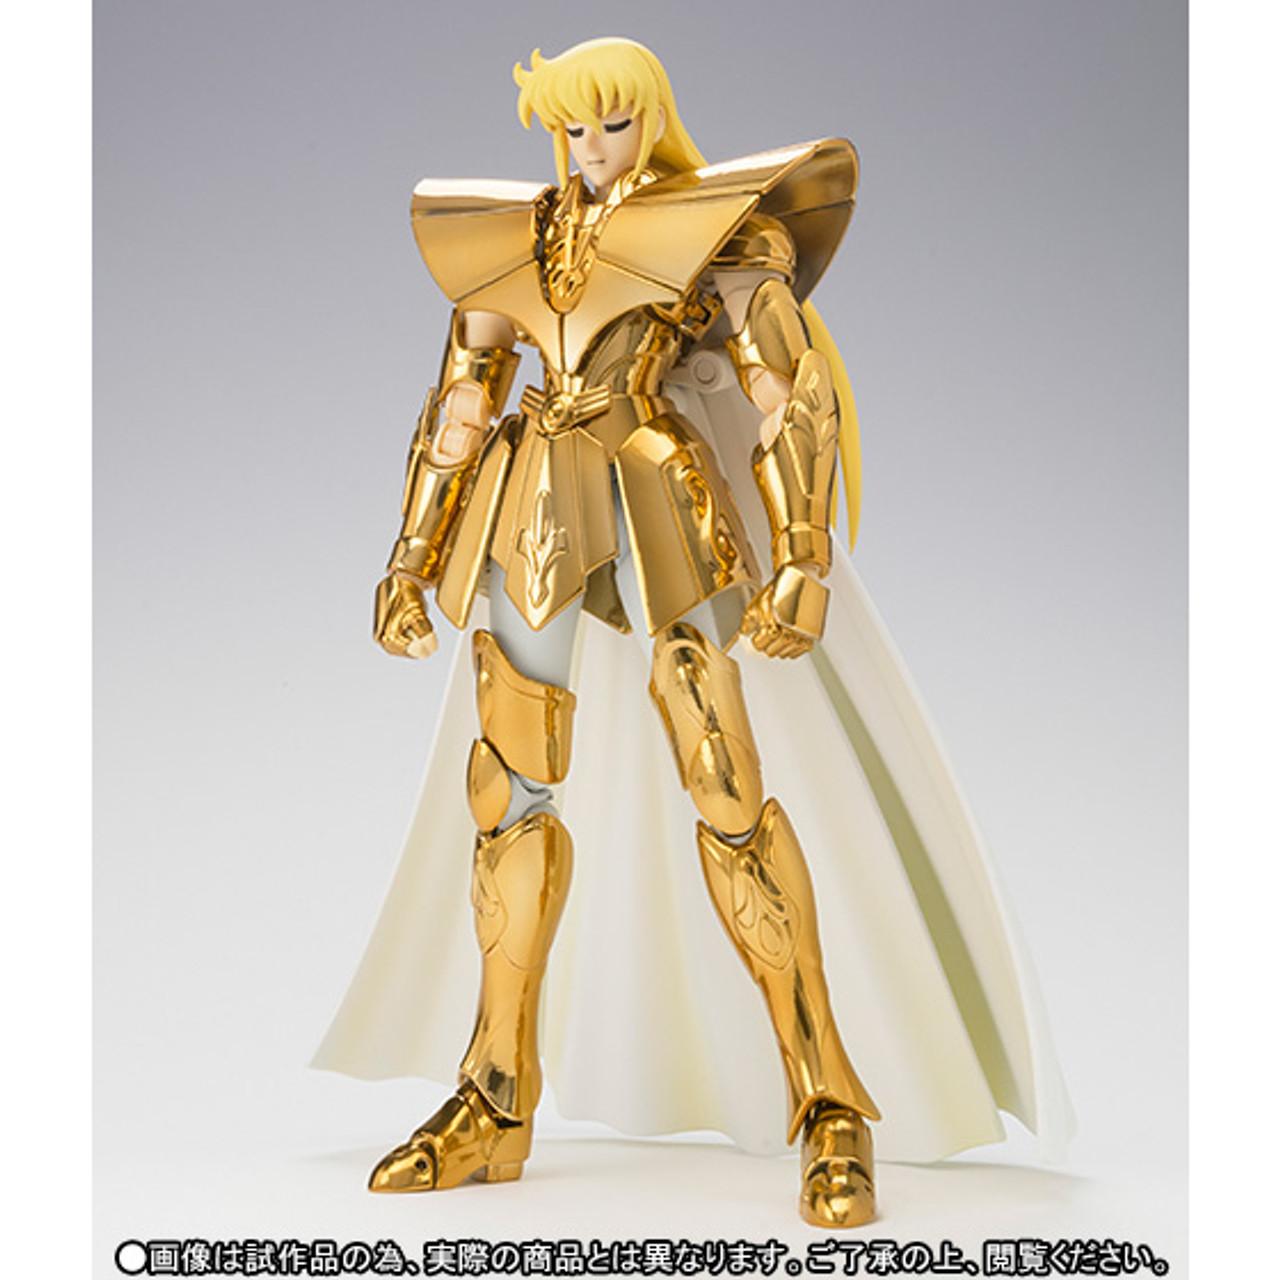 Bandai Saint Seiya Myth Cloth EX Virgo Shaka Revival version Action Figure NEW